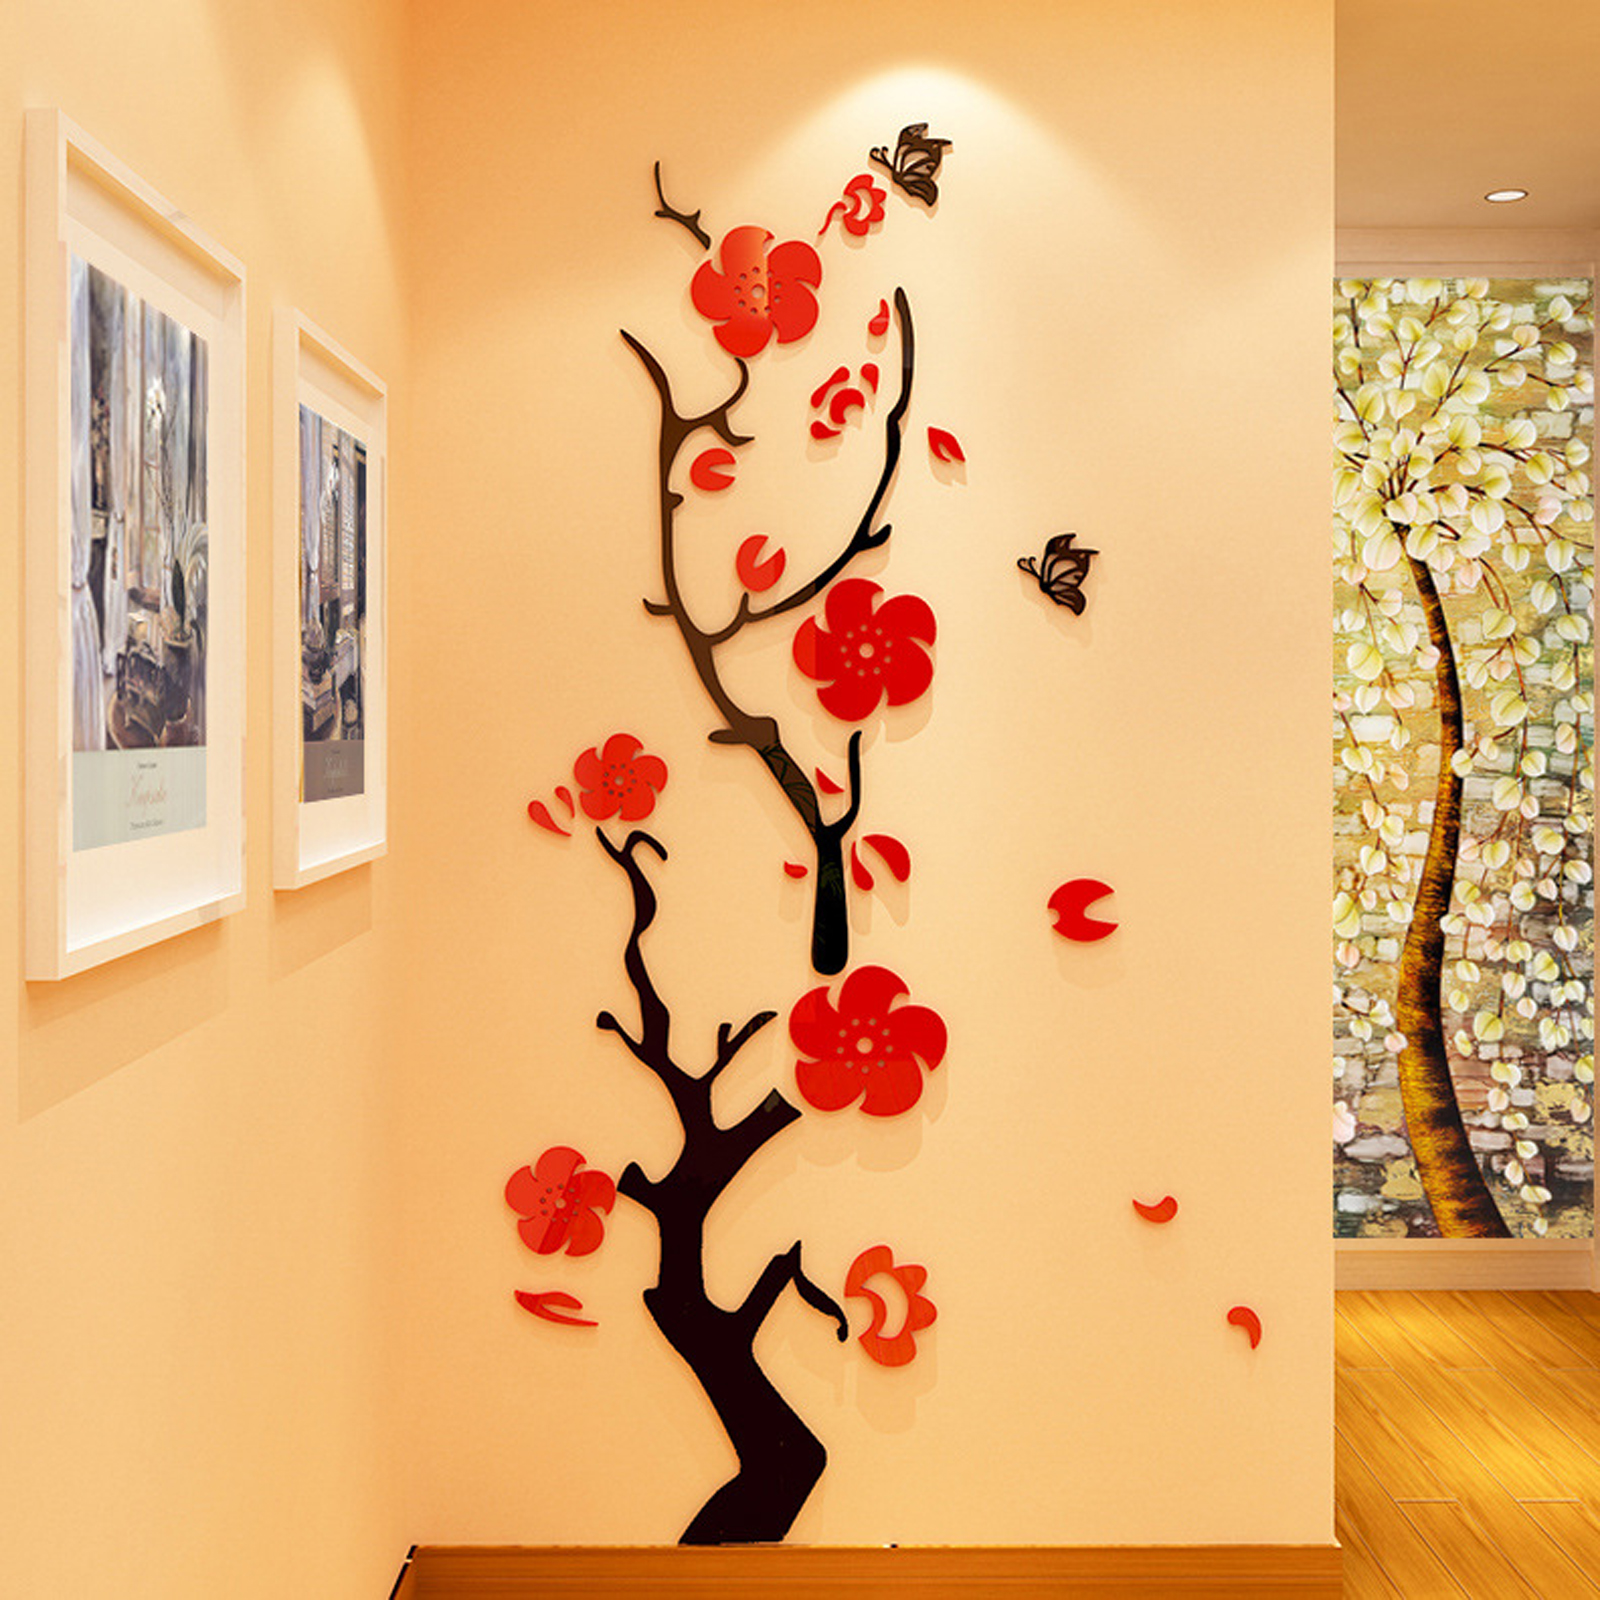 Perfect Diy Tree Wall Art Component - Wall Art Ideas - dochista.info